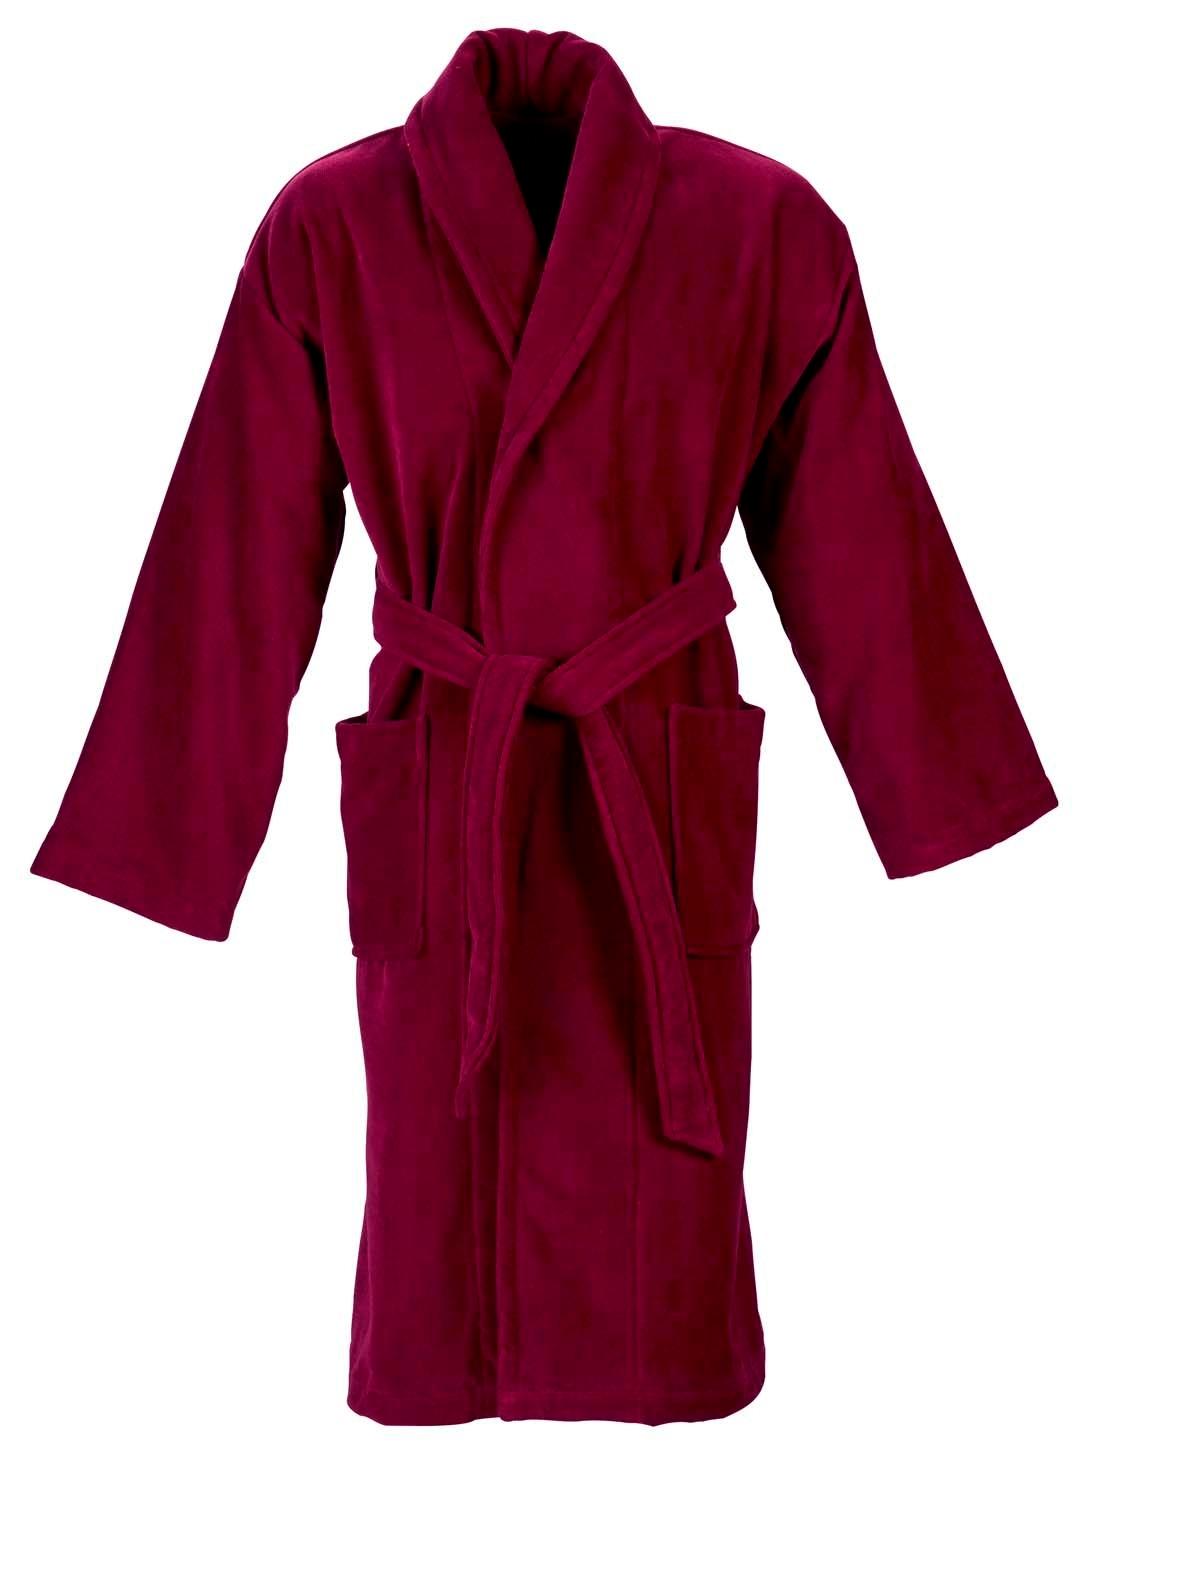 31eba4e355 Designer Sleepwear - Luxury Lingerie - Harvey Nichols